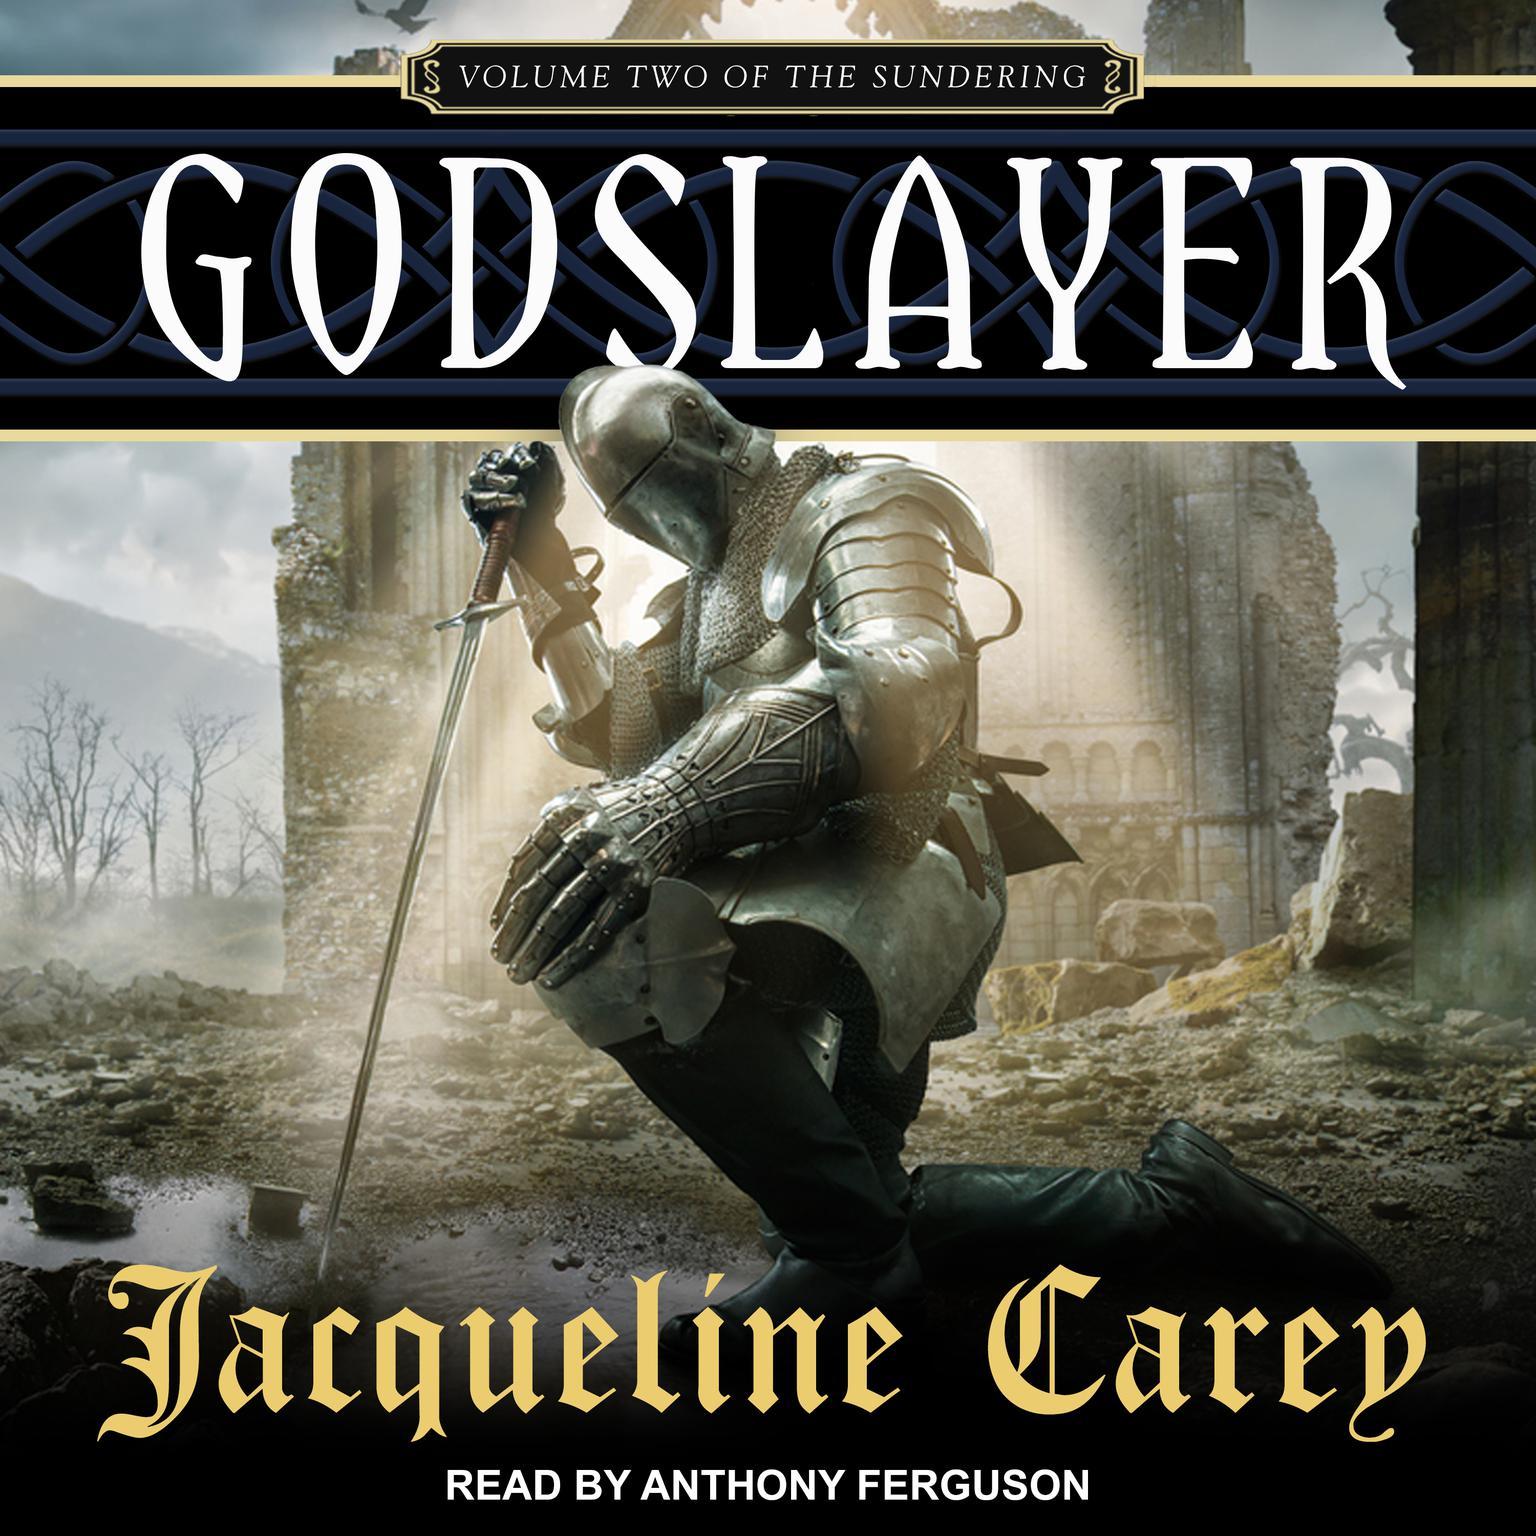 Godslayer: Volume II of The Sundering Audiobook, by Jacqueline Carey